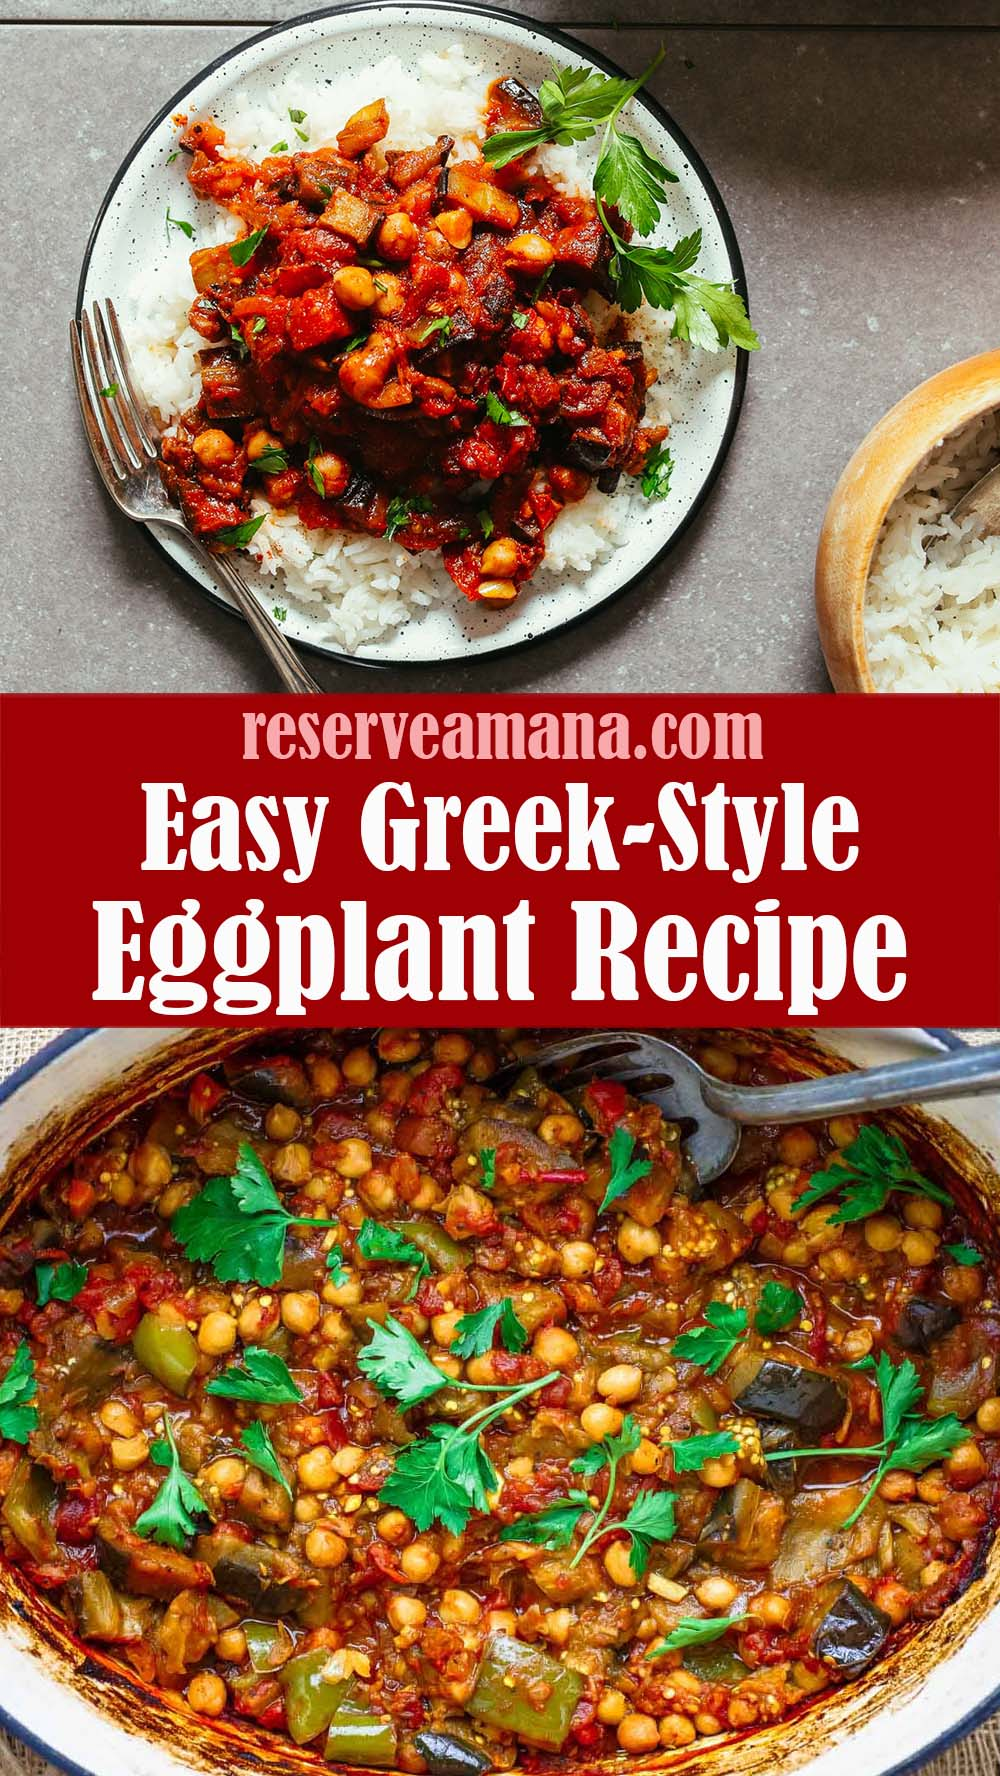 Easy Greek-Style Eggplant Recipe